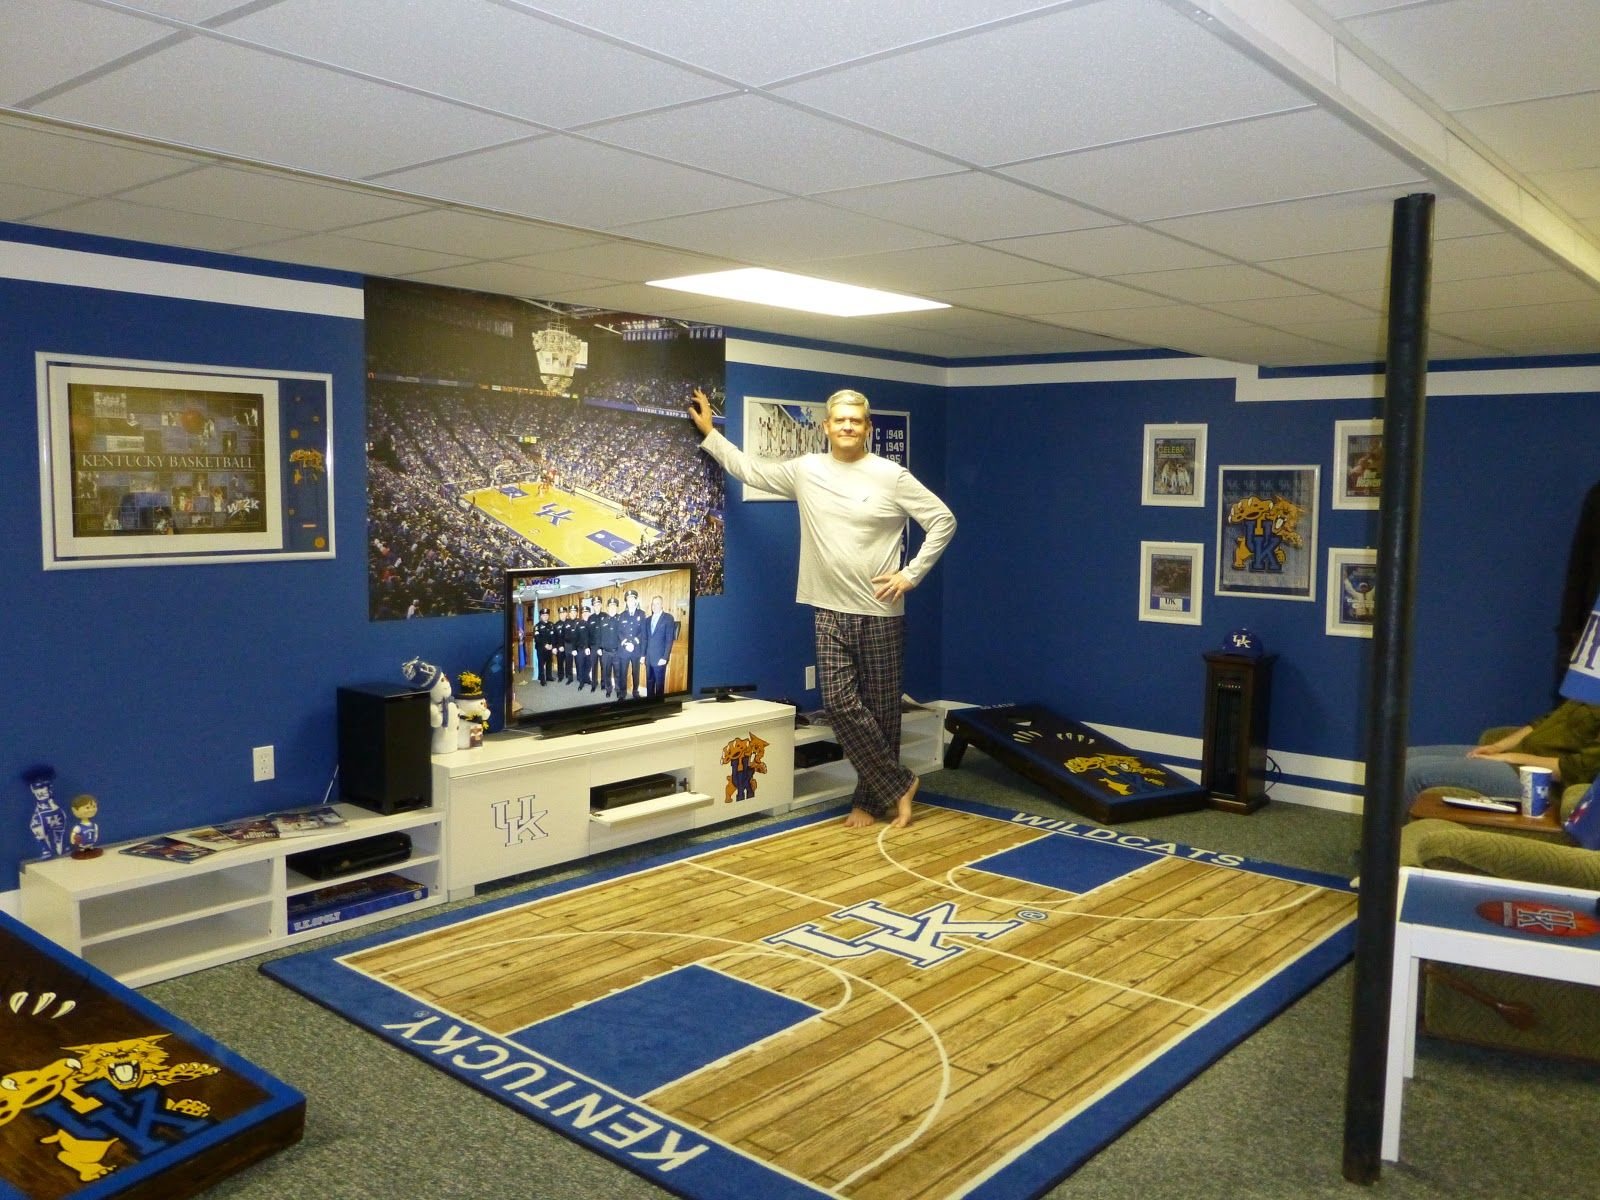 Uk Basketball: The Lazy Girl's Blog #University Of Kentucky #Man Caves